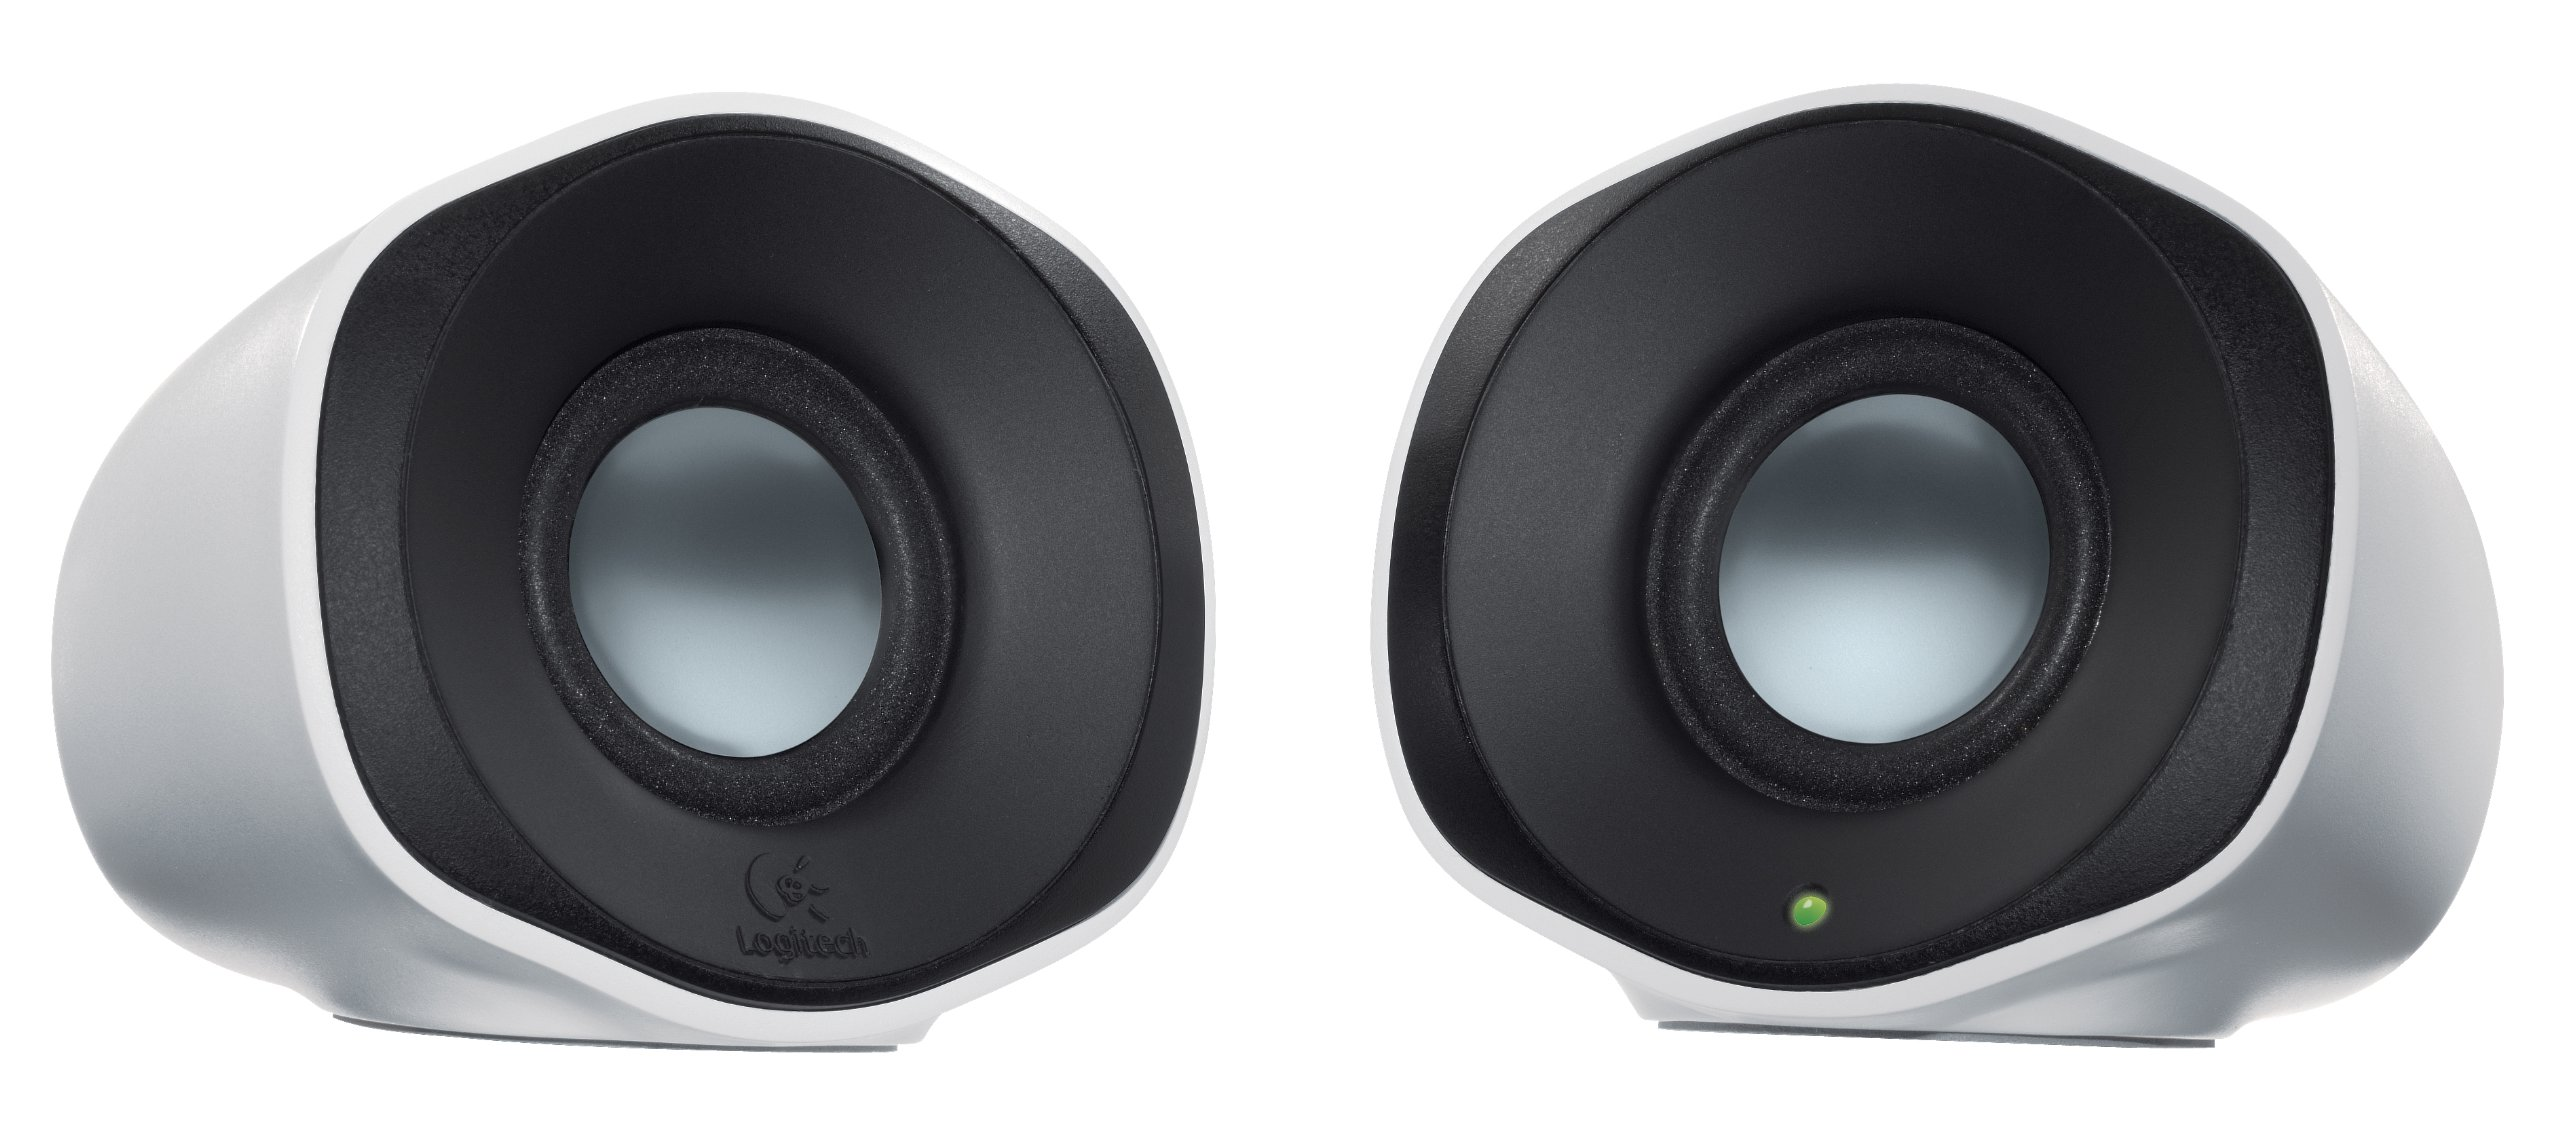 LOG980000522 - LOGITECH, INC. Z110 Stereo Speakers by Logitech